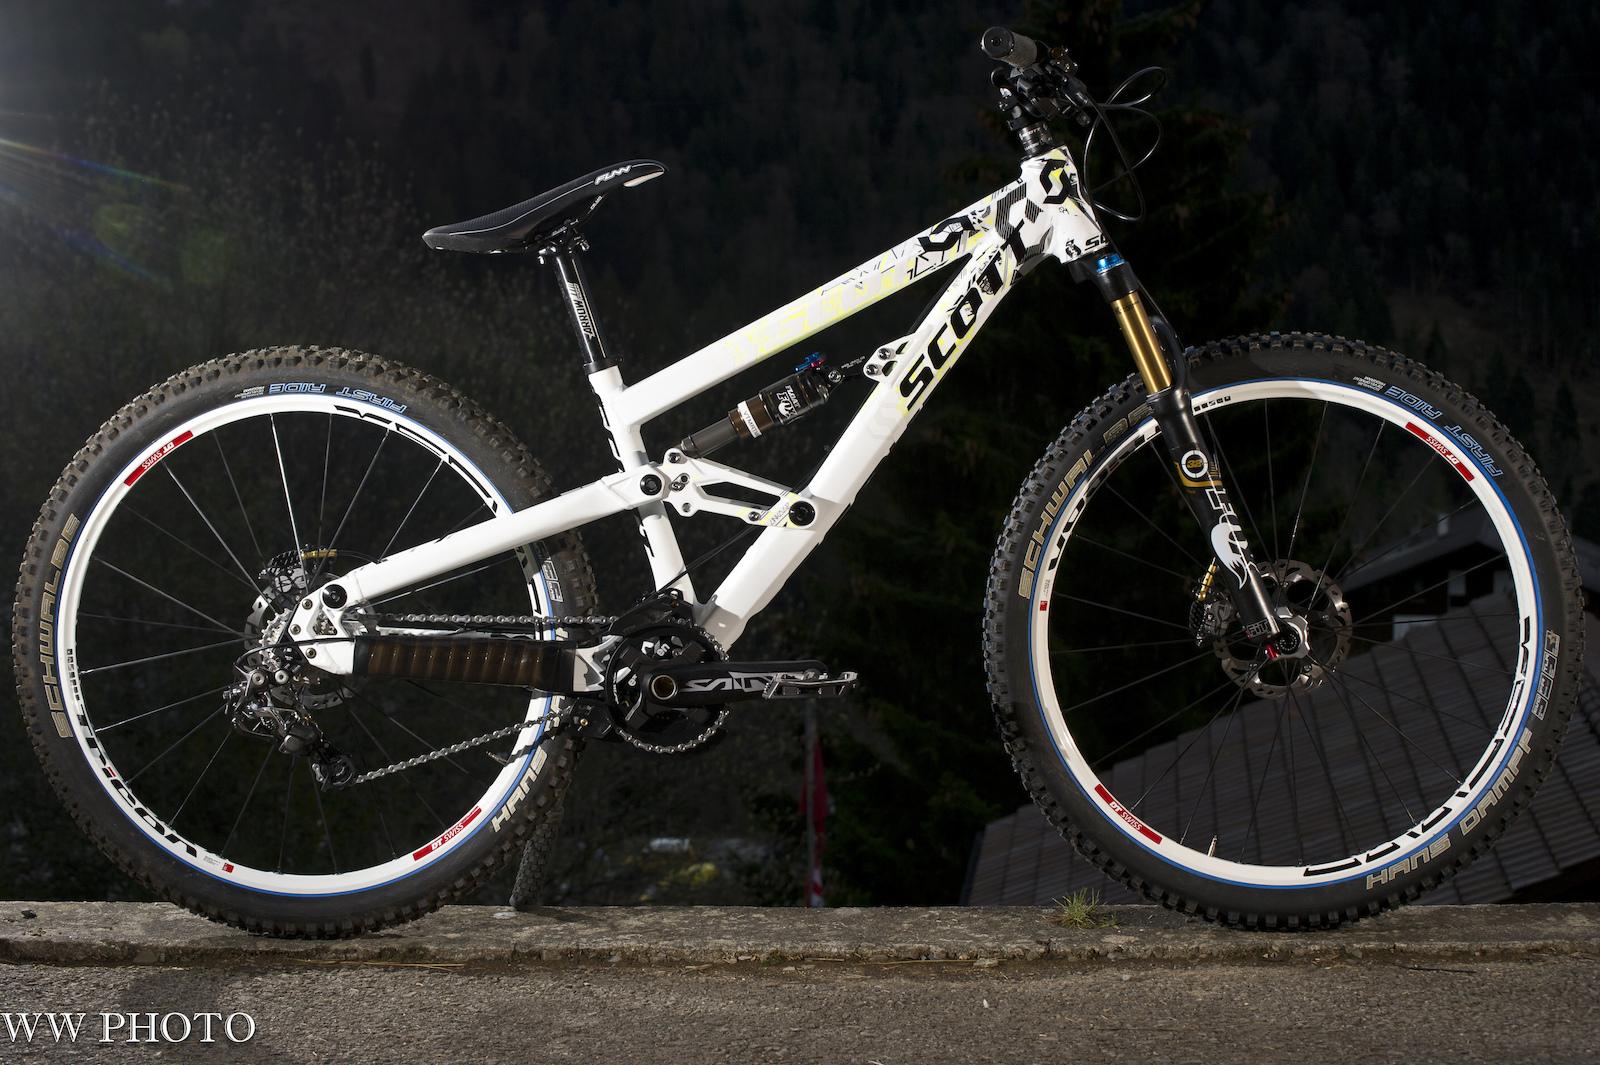 Neue SAINT Parts am SCOTT 4X Fully Prototype von Brendan Fairclough